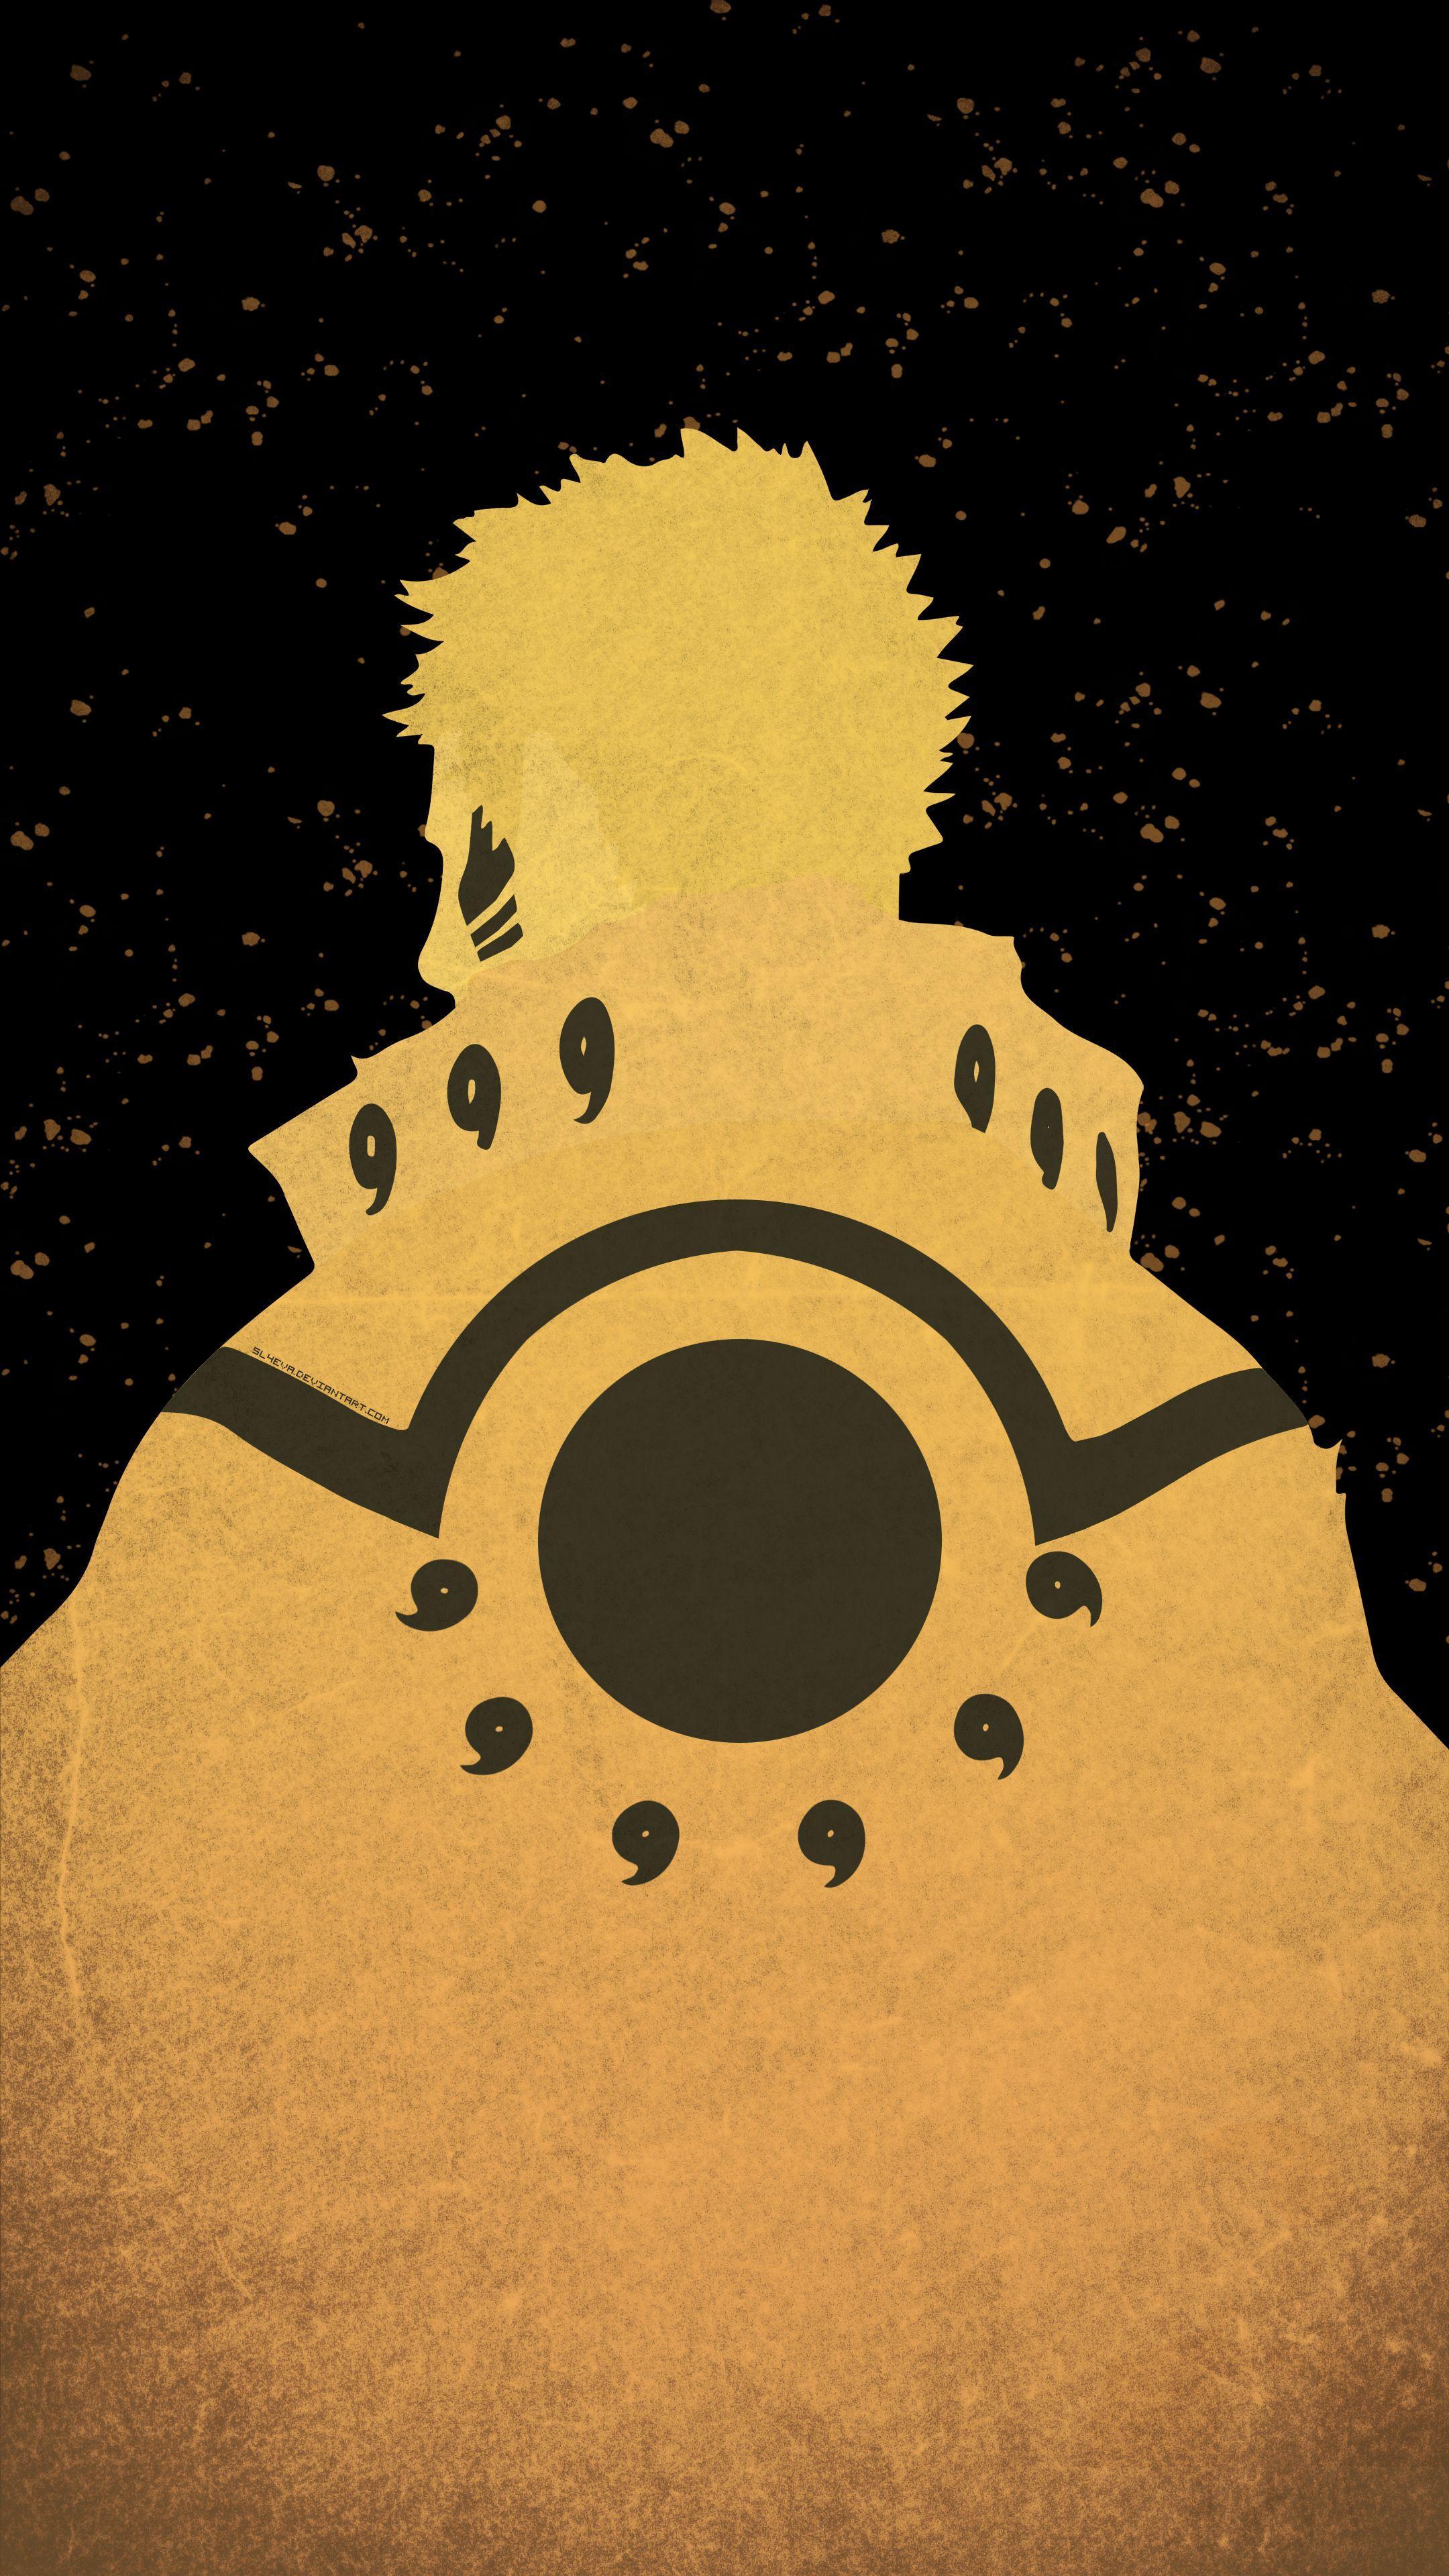 Cool Naruto Phone Wallpapers   Top Free Cool Naruto Phone ...